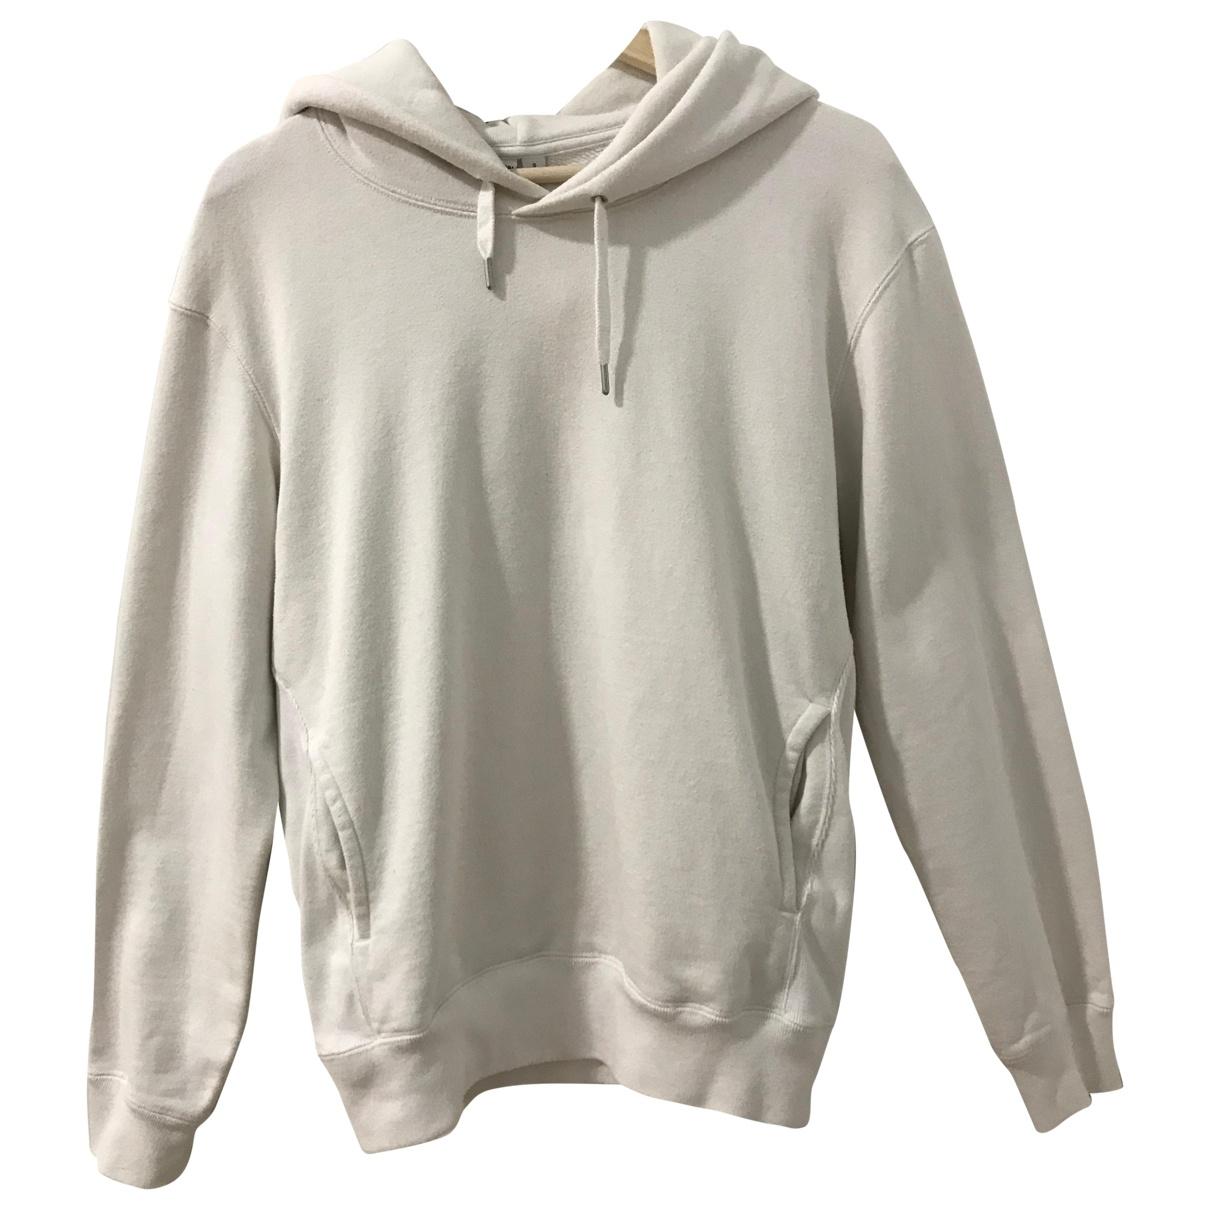 Uniqlo \N White Cotton Knitwear & Sweatshirts for Men S International